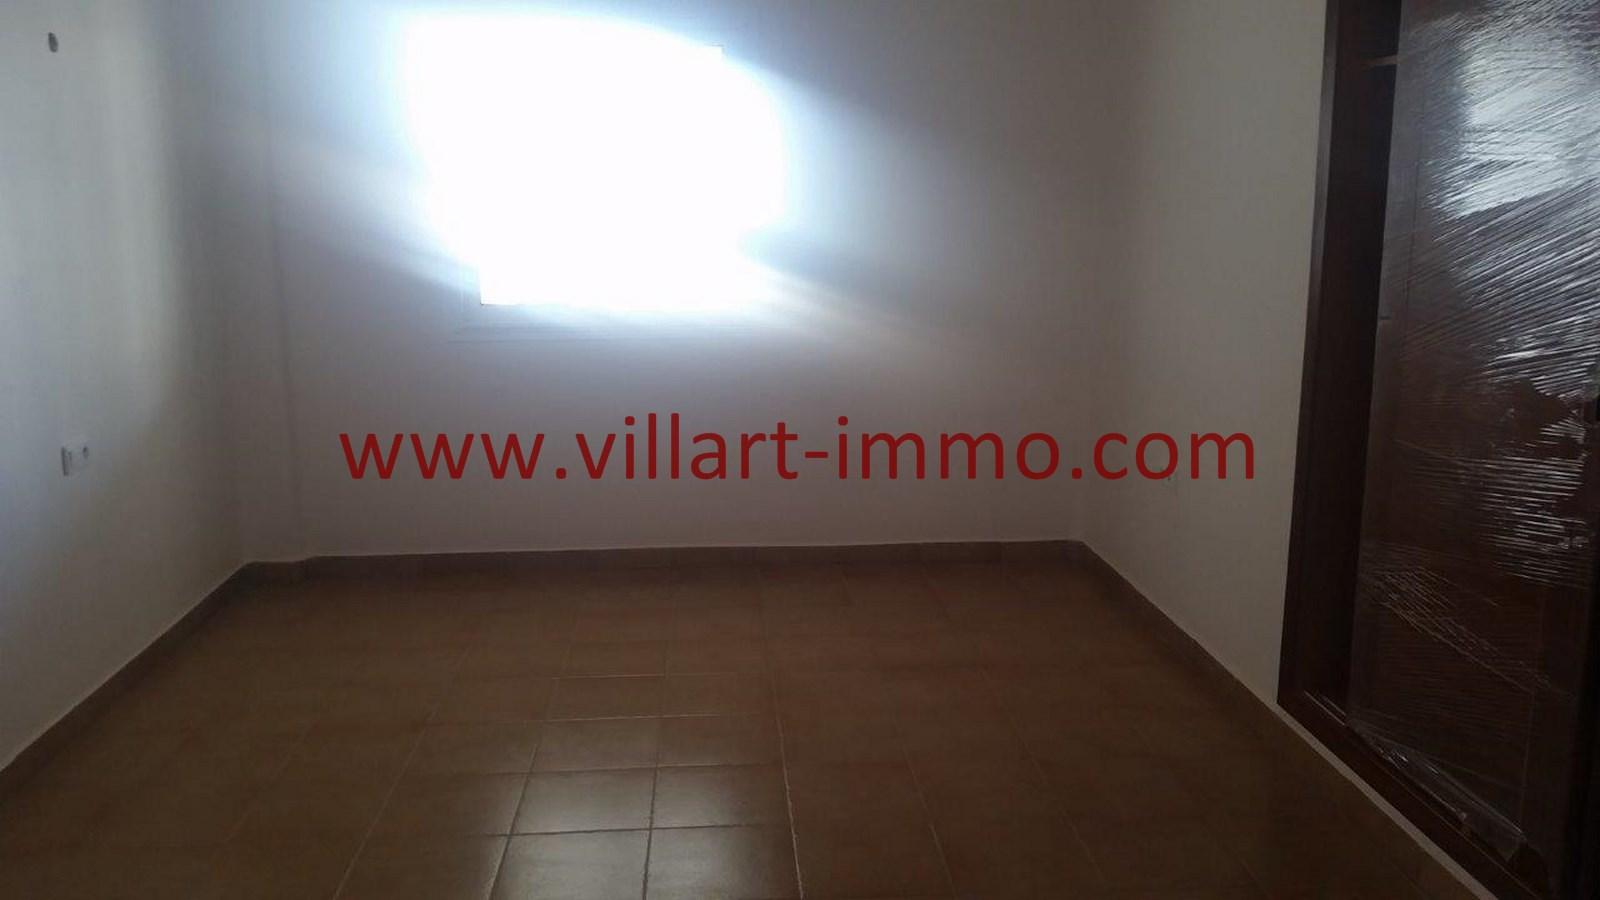 5-vente-appartement-region-tetouan-mdiq-chambre-1-va395-villart-immo